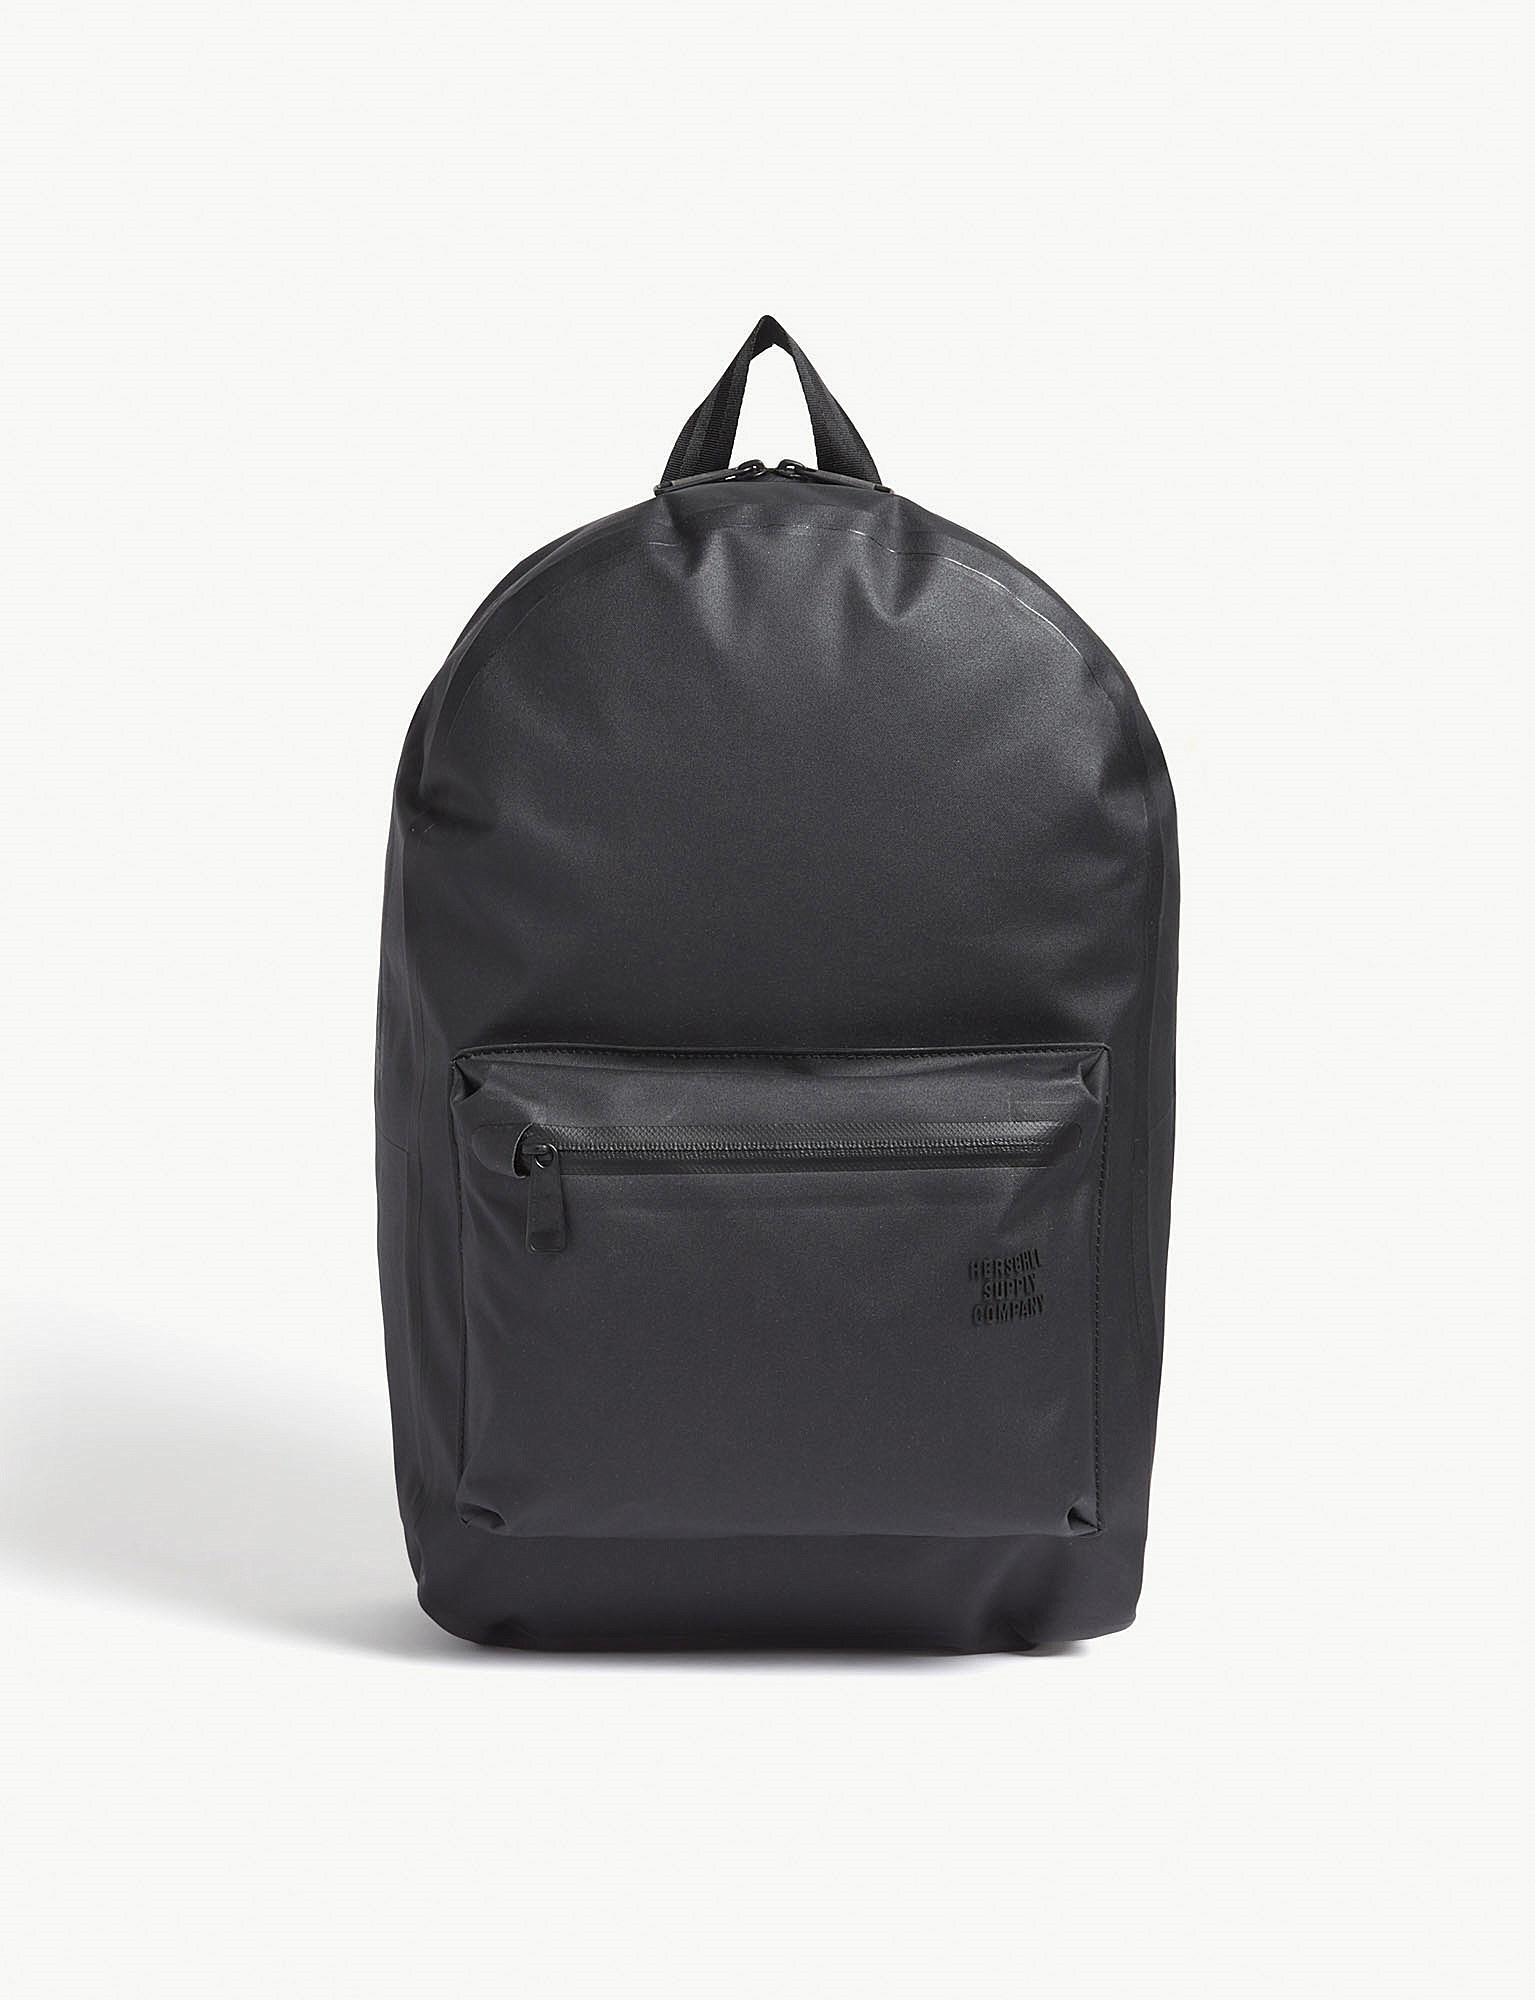 c61835b91c Herschel Supply Co. . Black Settlement Backpack in Black for Men - Lyst